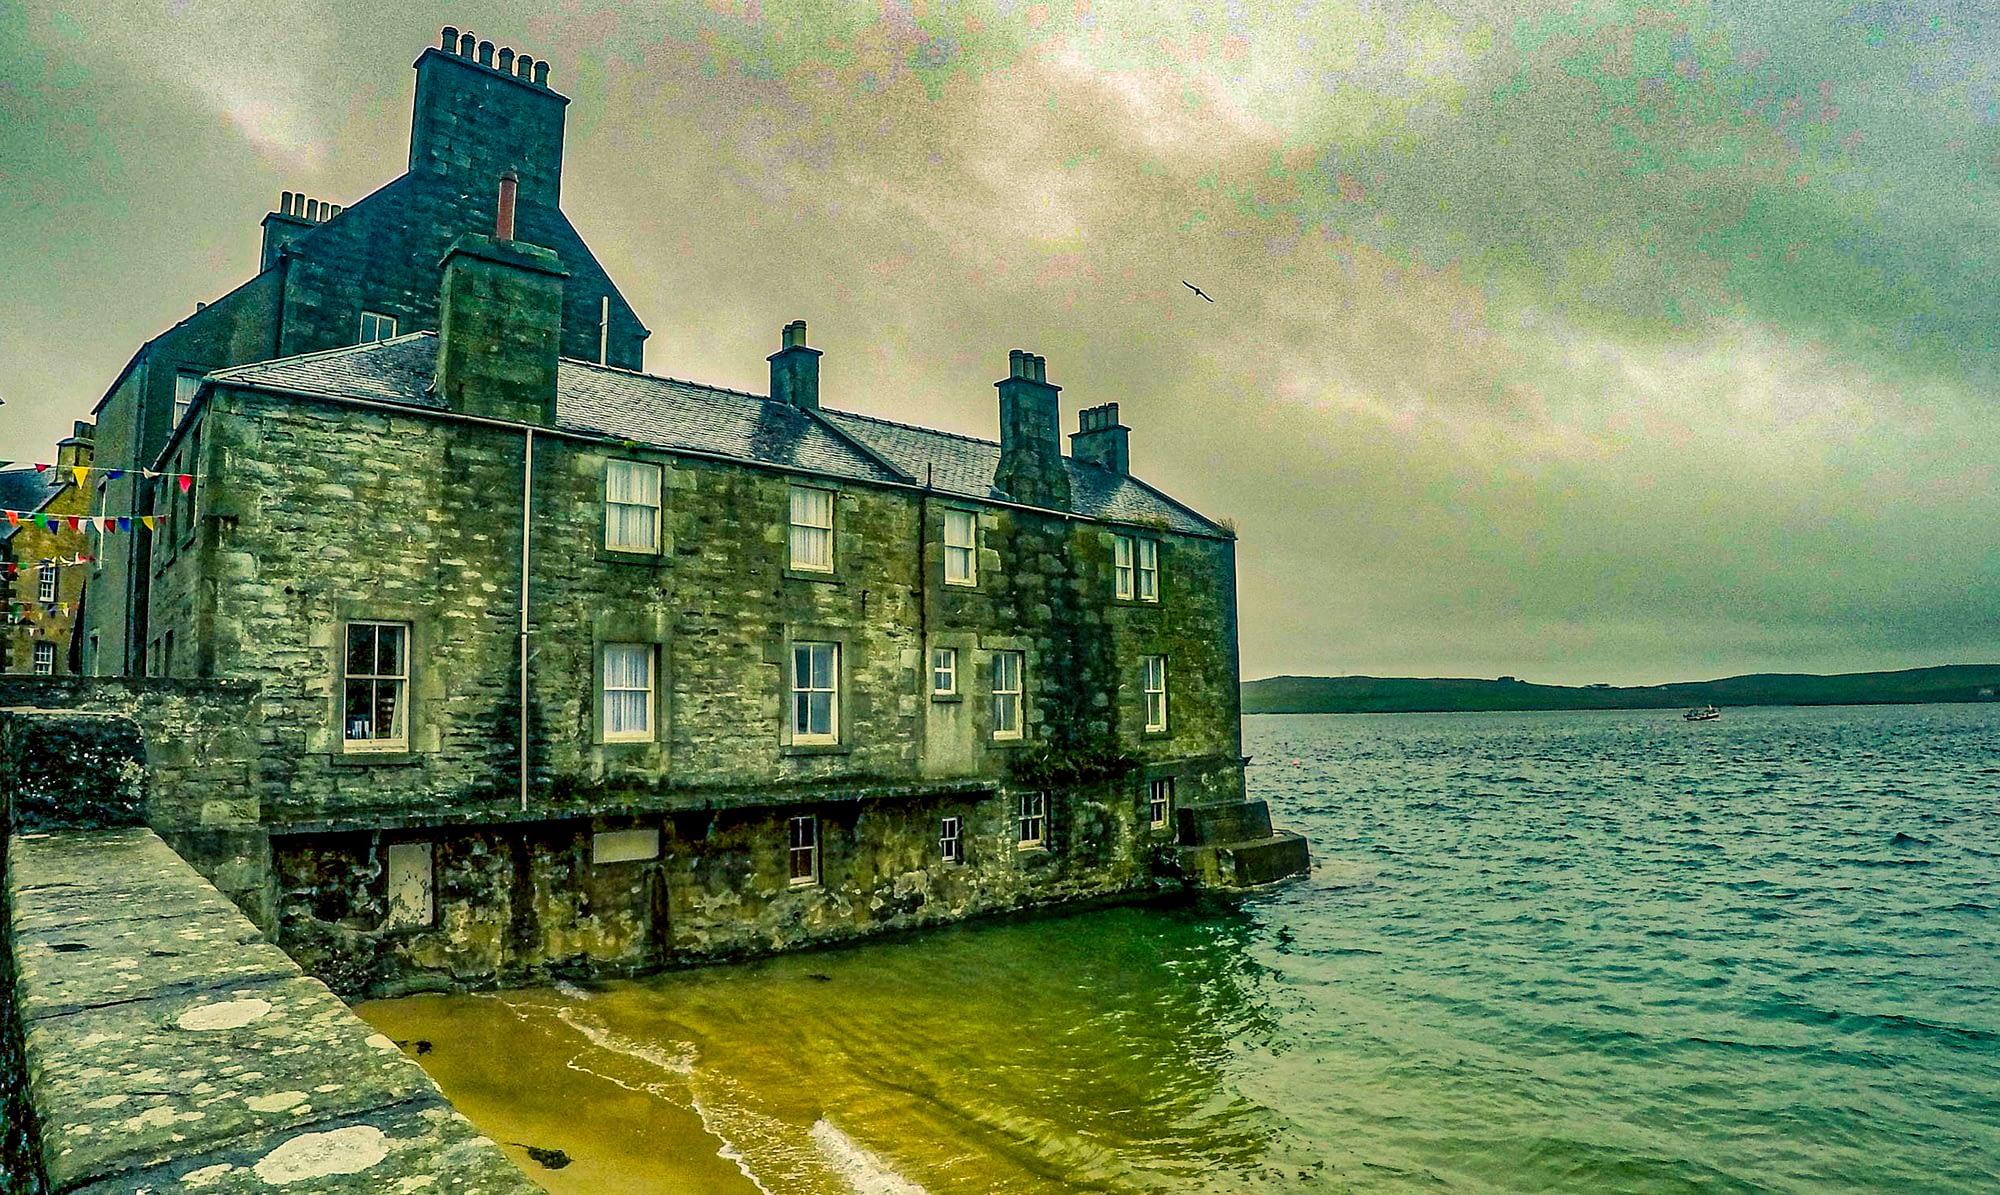 Inverness, Orkney Islands, Scotland